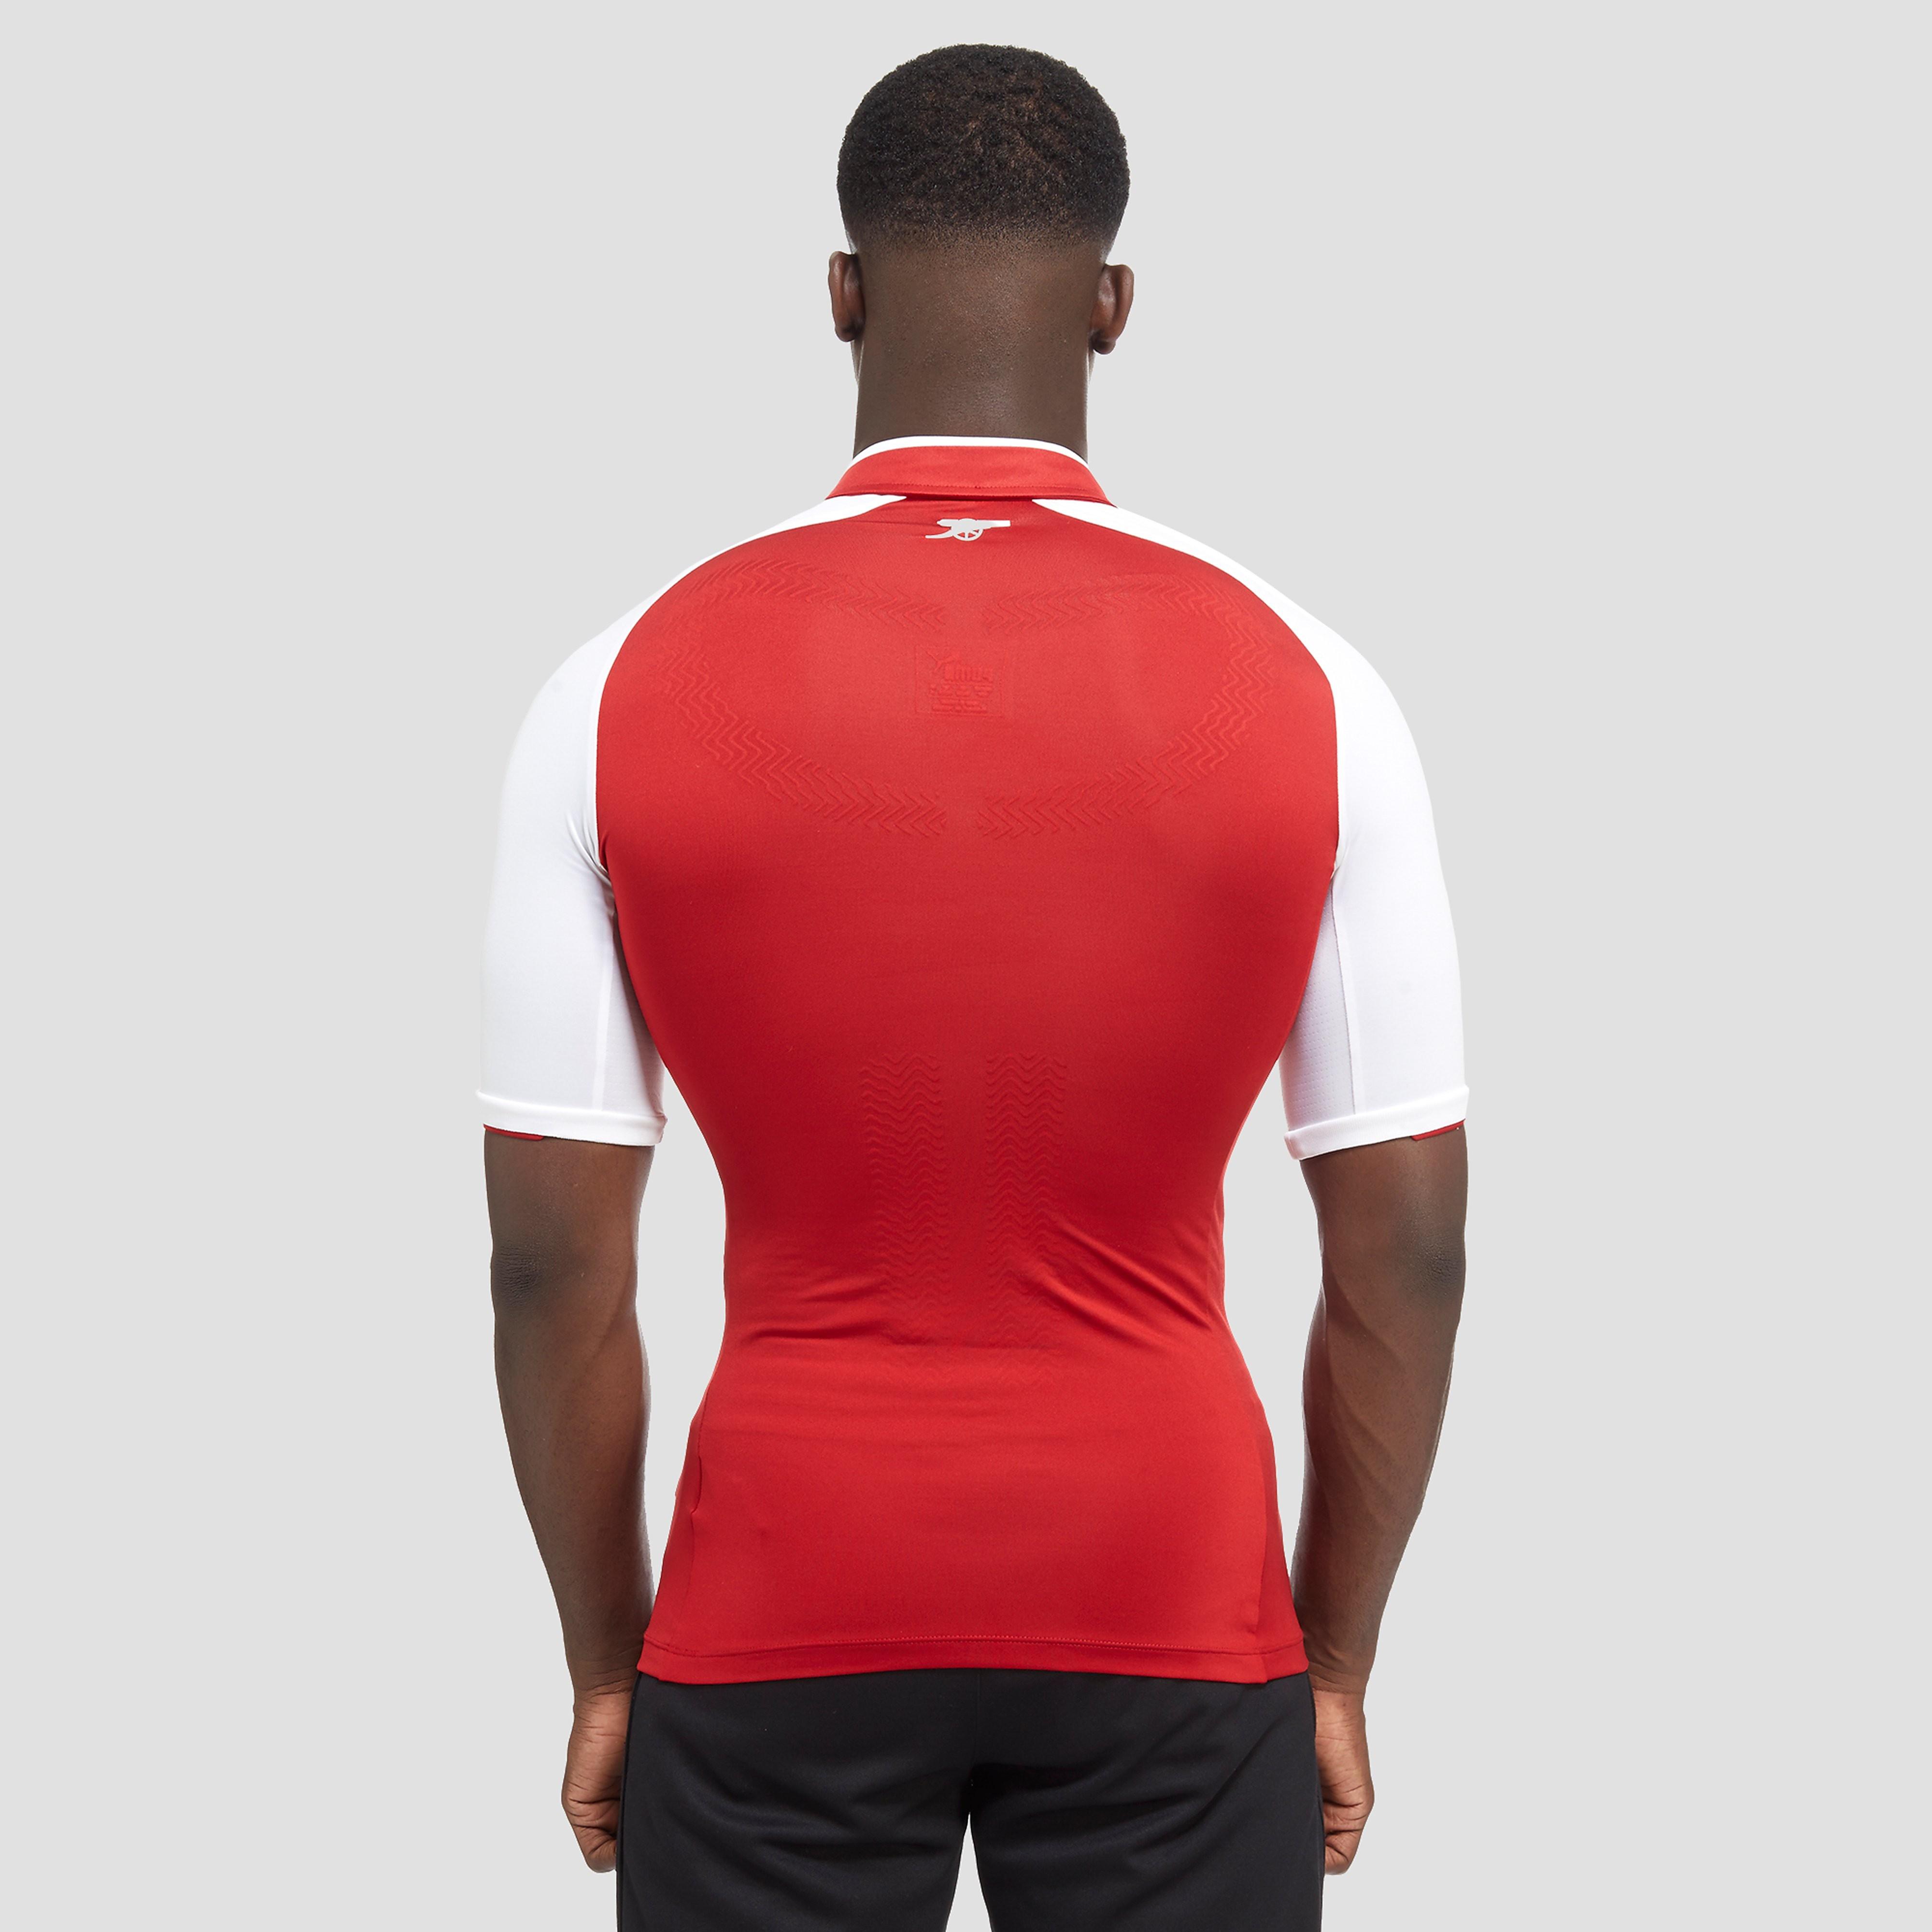 PUMA Arsenal FC 2017/18 Authentic Home Shirt